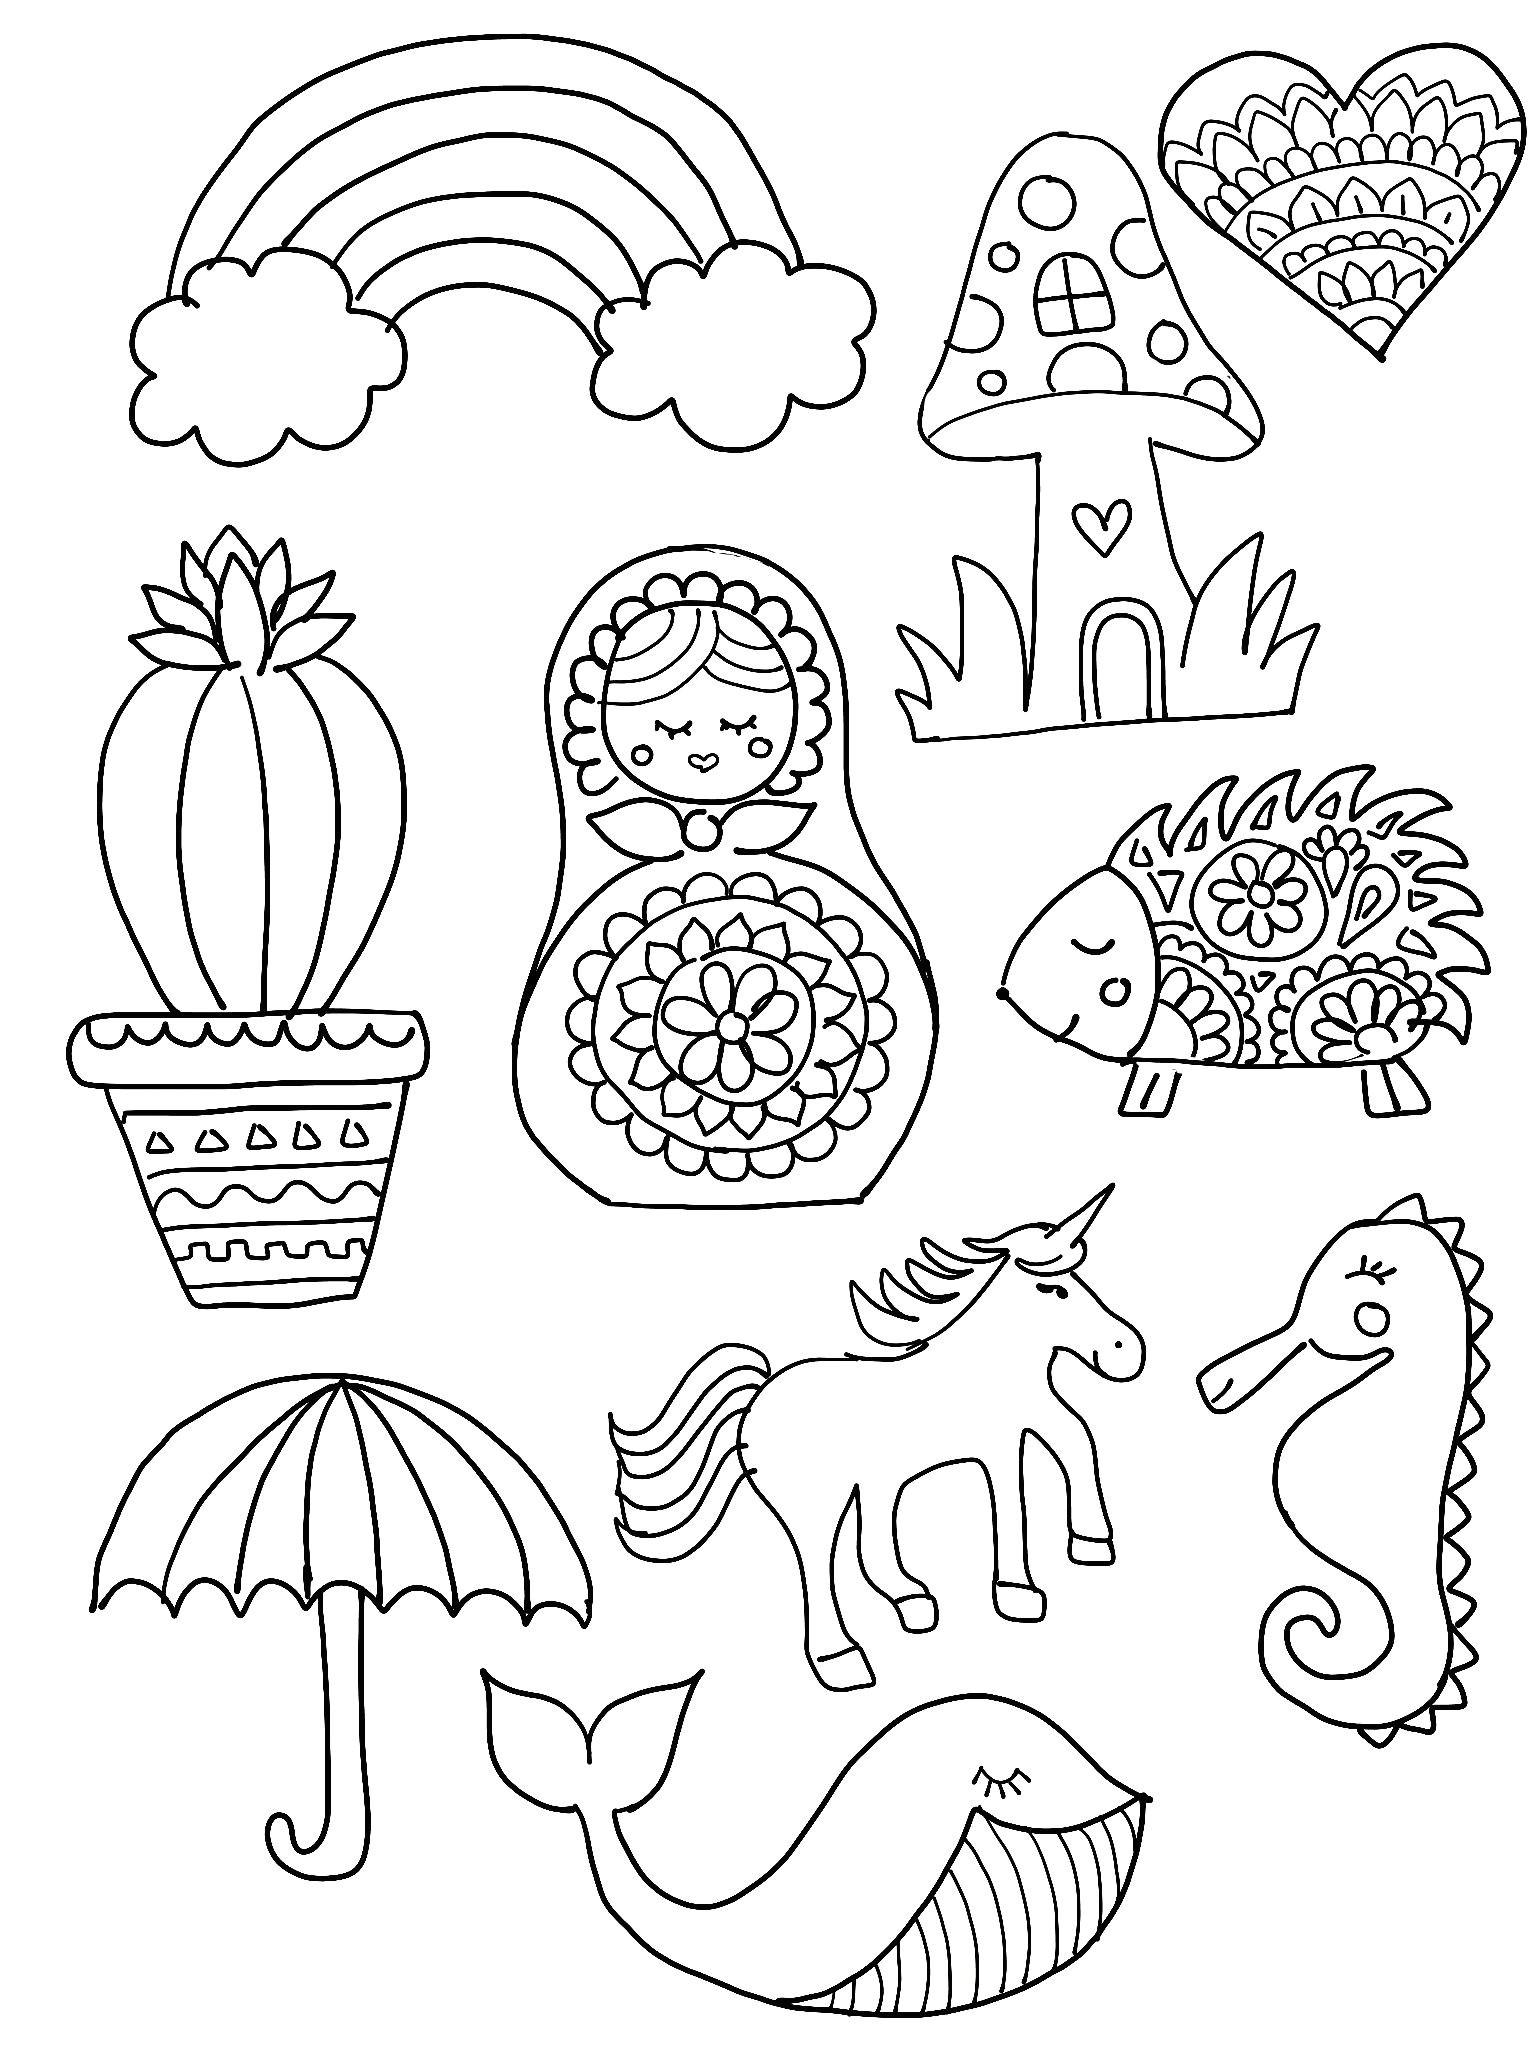 Shrinky Dink Printable Templates Diy Shrinky Dink Charms Shrinky Dinks Hedgehogs and Cacti